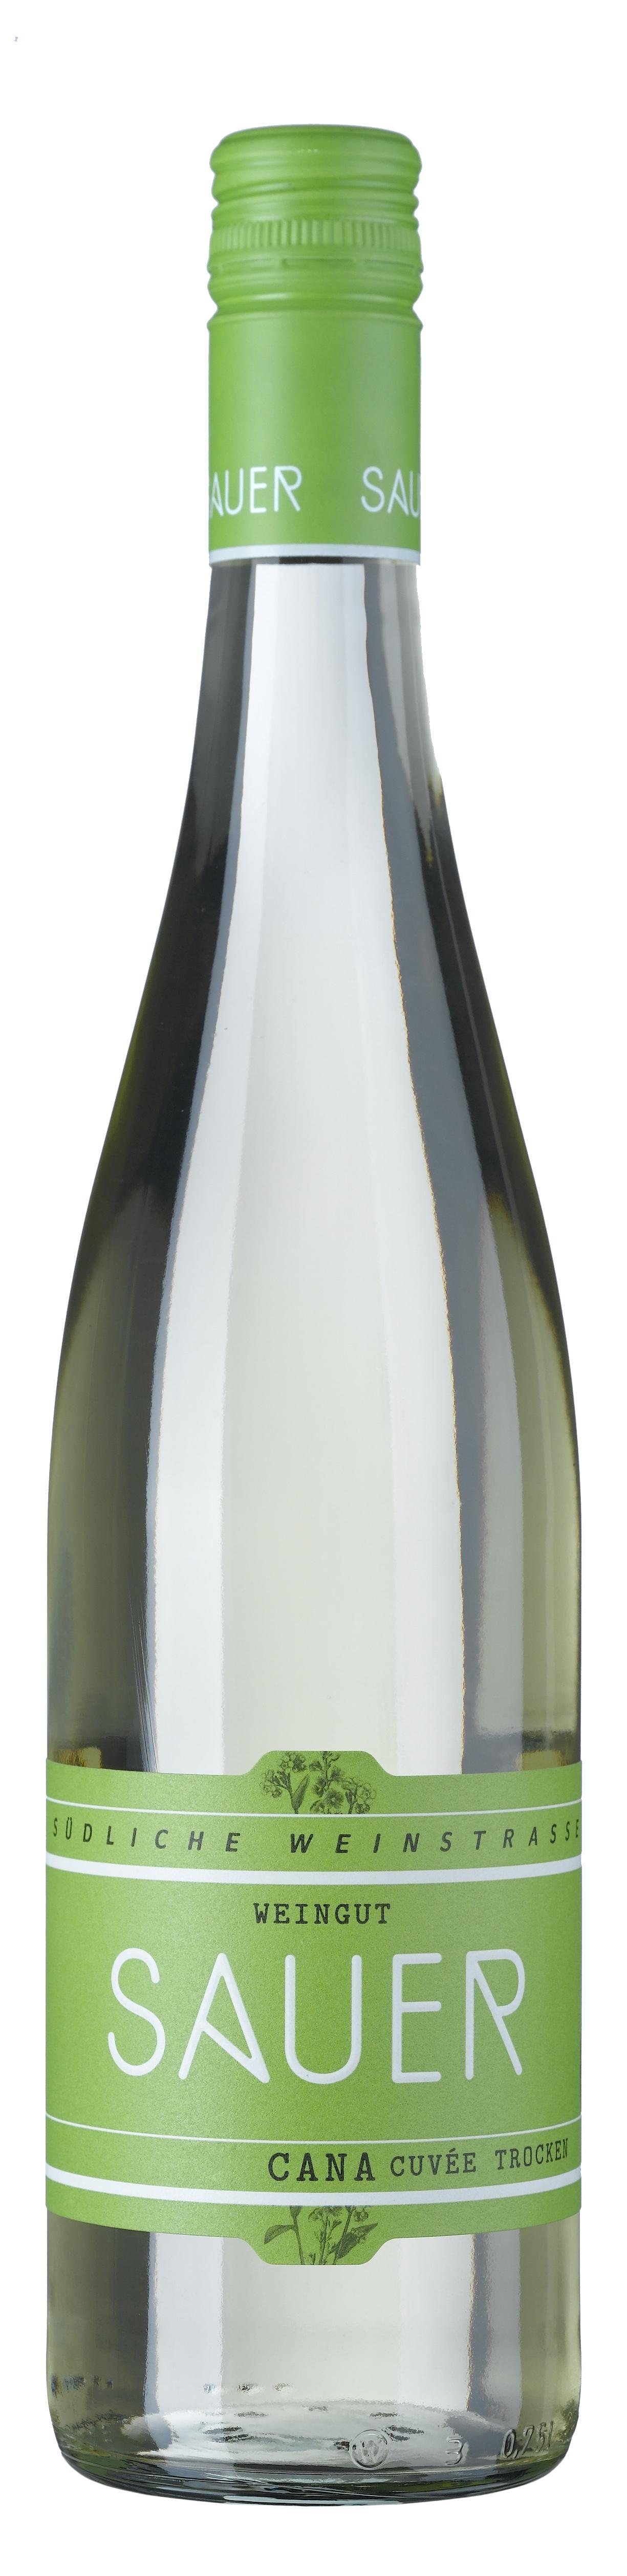 Weingut Heiner Sauer Cuvée Cana 2019